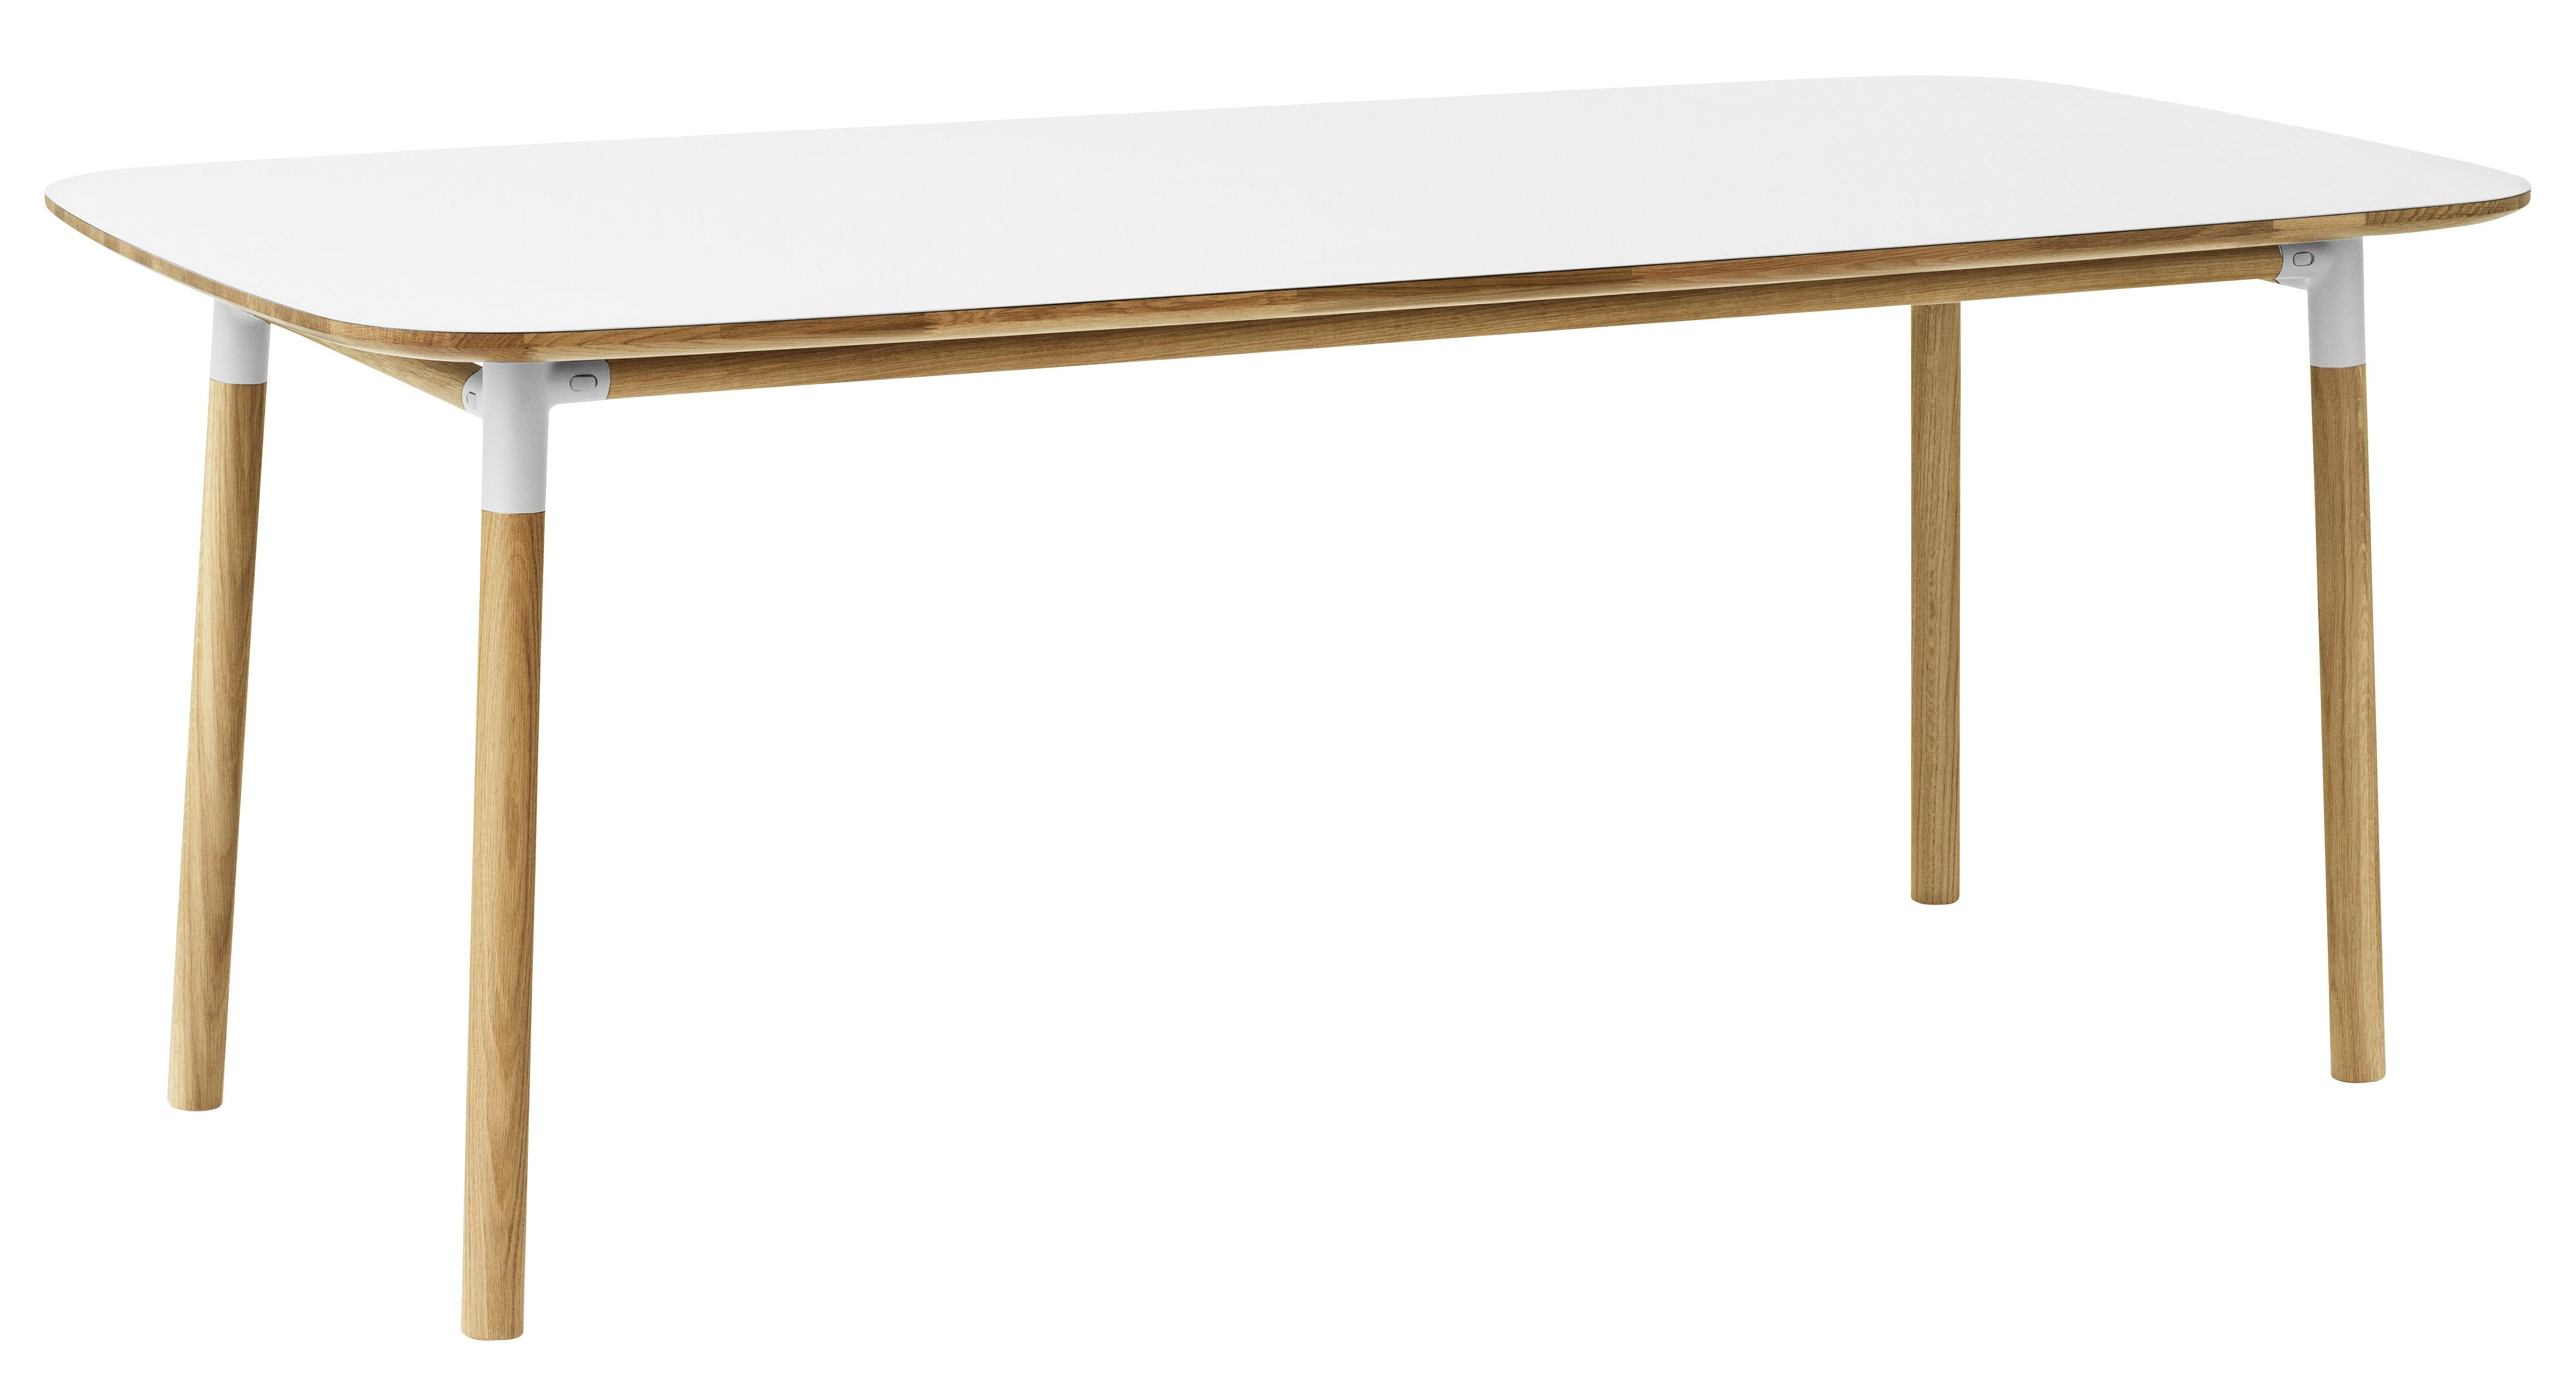 form 95 x 200 cm normann copenhagen tisch. Black Bedroom Furniture Sets. Home Design Ideas